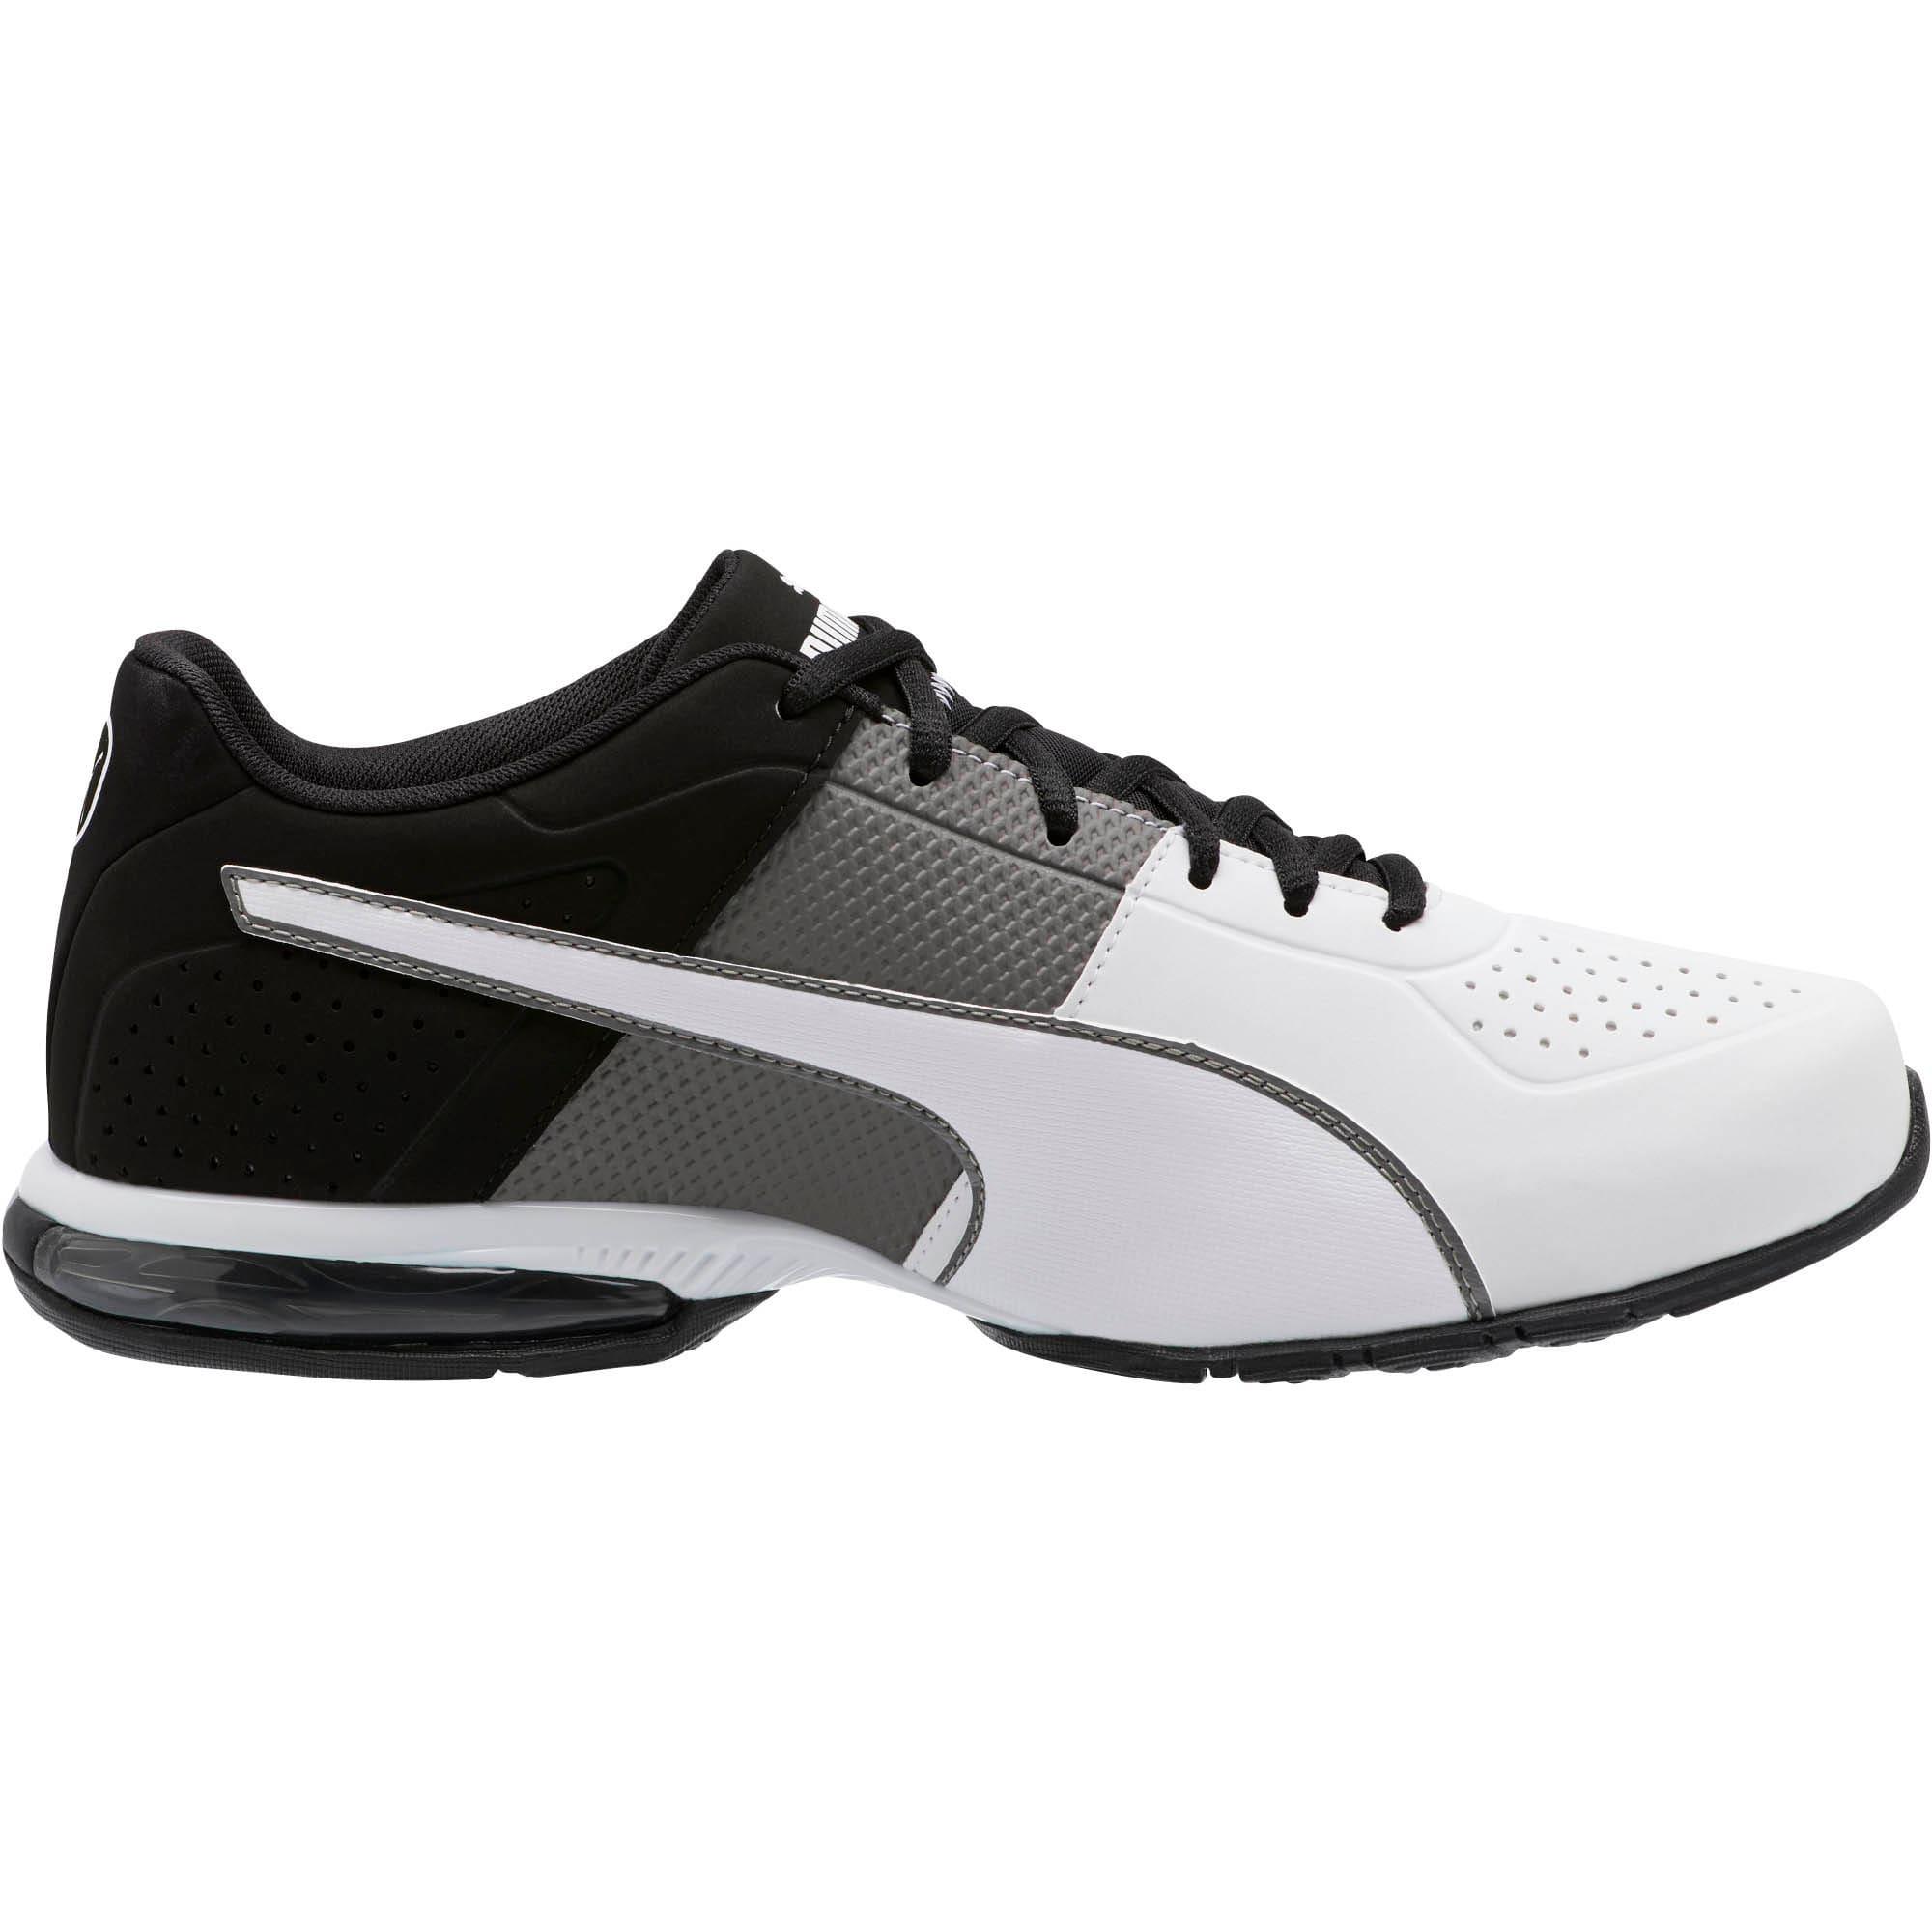 Thumbnail 4 of CELL Surin 2 Matte Men's Training Shoes, Charcoal Gray-Puma White, medium